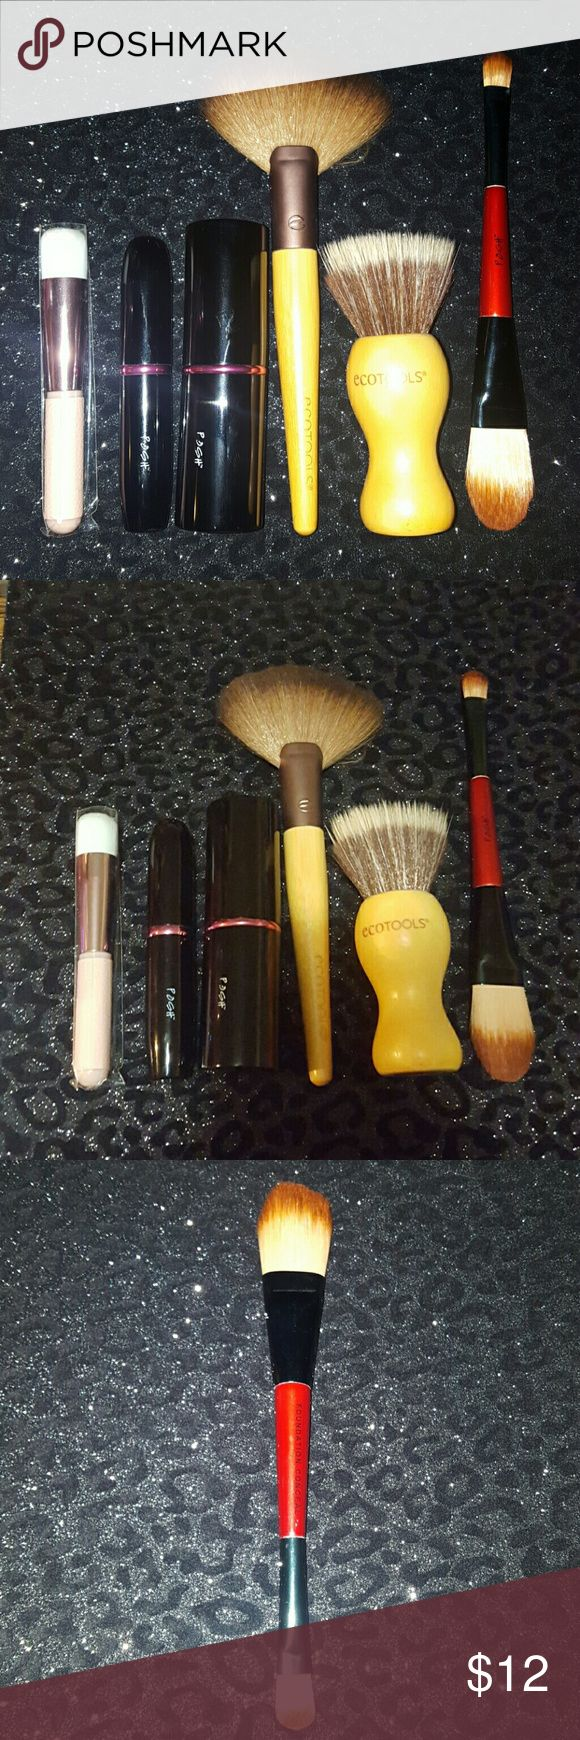 Makeup Brush Bundle -Posh, EcoTools & Physicians F Makeup Brush Bundle. SOME ARE USED & SOME NEW. You get 3 POSH Brushes: Retractable Kabuki Brush, Retractable Blush Brush, & Double Ended Foundation/Concealer Brush. 2 Eco Tool Brushes: 1 is a Kabuki Stippling Brush & Fan Brush BOTH BRAND NEW. & A Brand New Physicians Formula Foundation Brush (still in wrapper). Physicians Formula Makeup Brushes & Tools